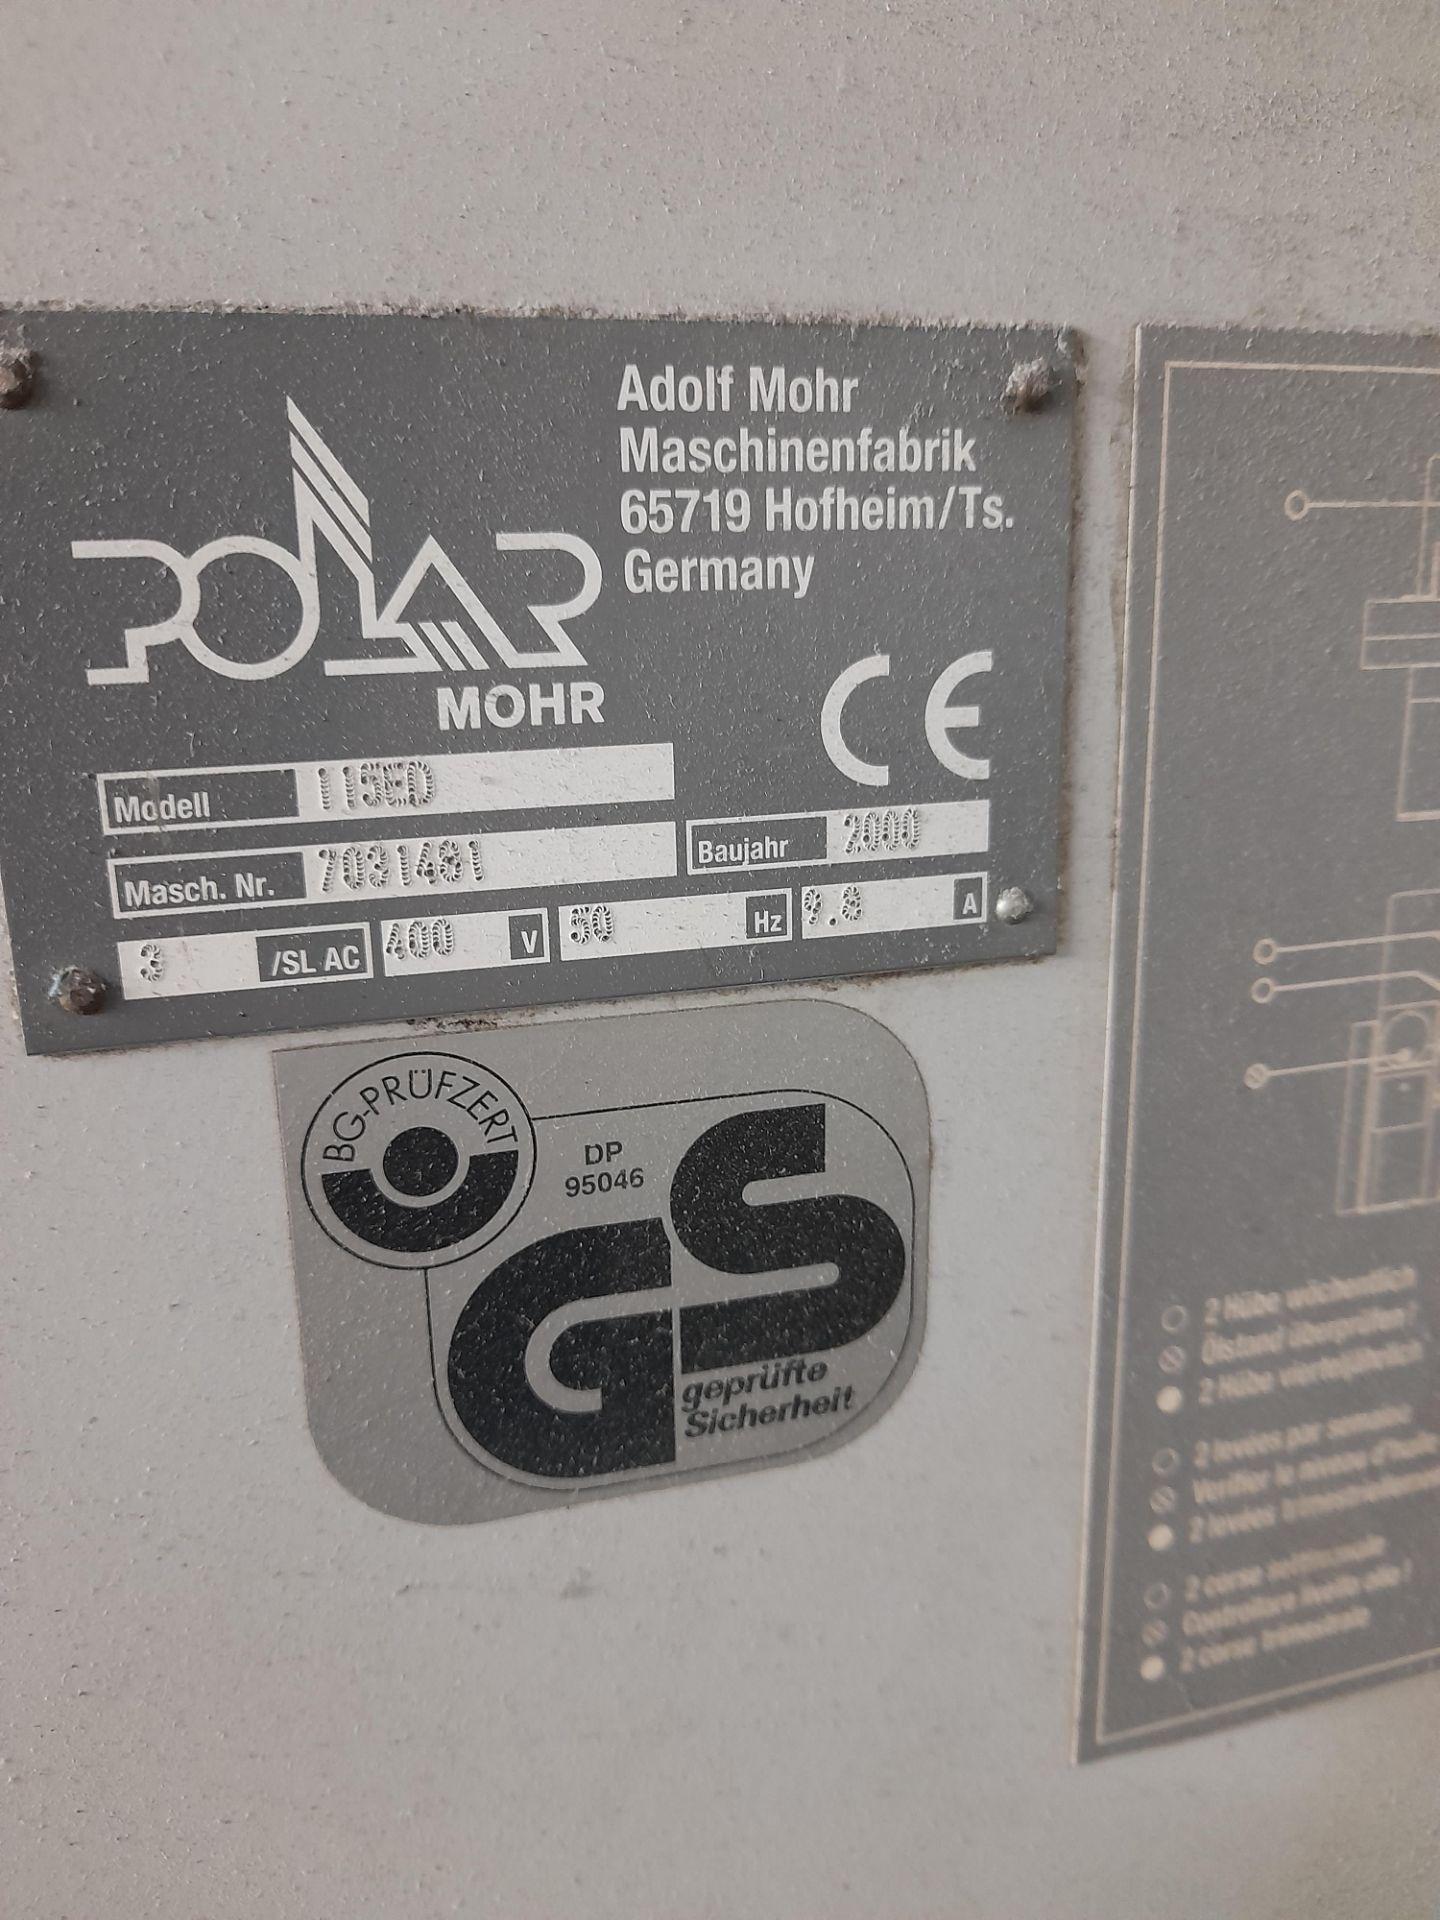 Polar Mohr 115 ED guillotine, Machine Number: 7031 - Image 7 of 9